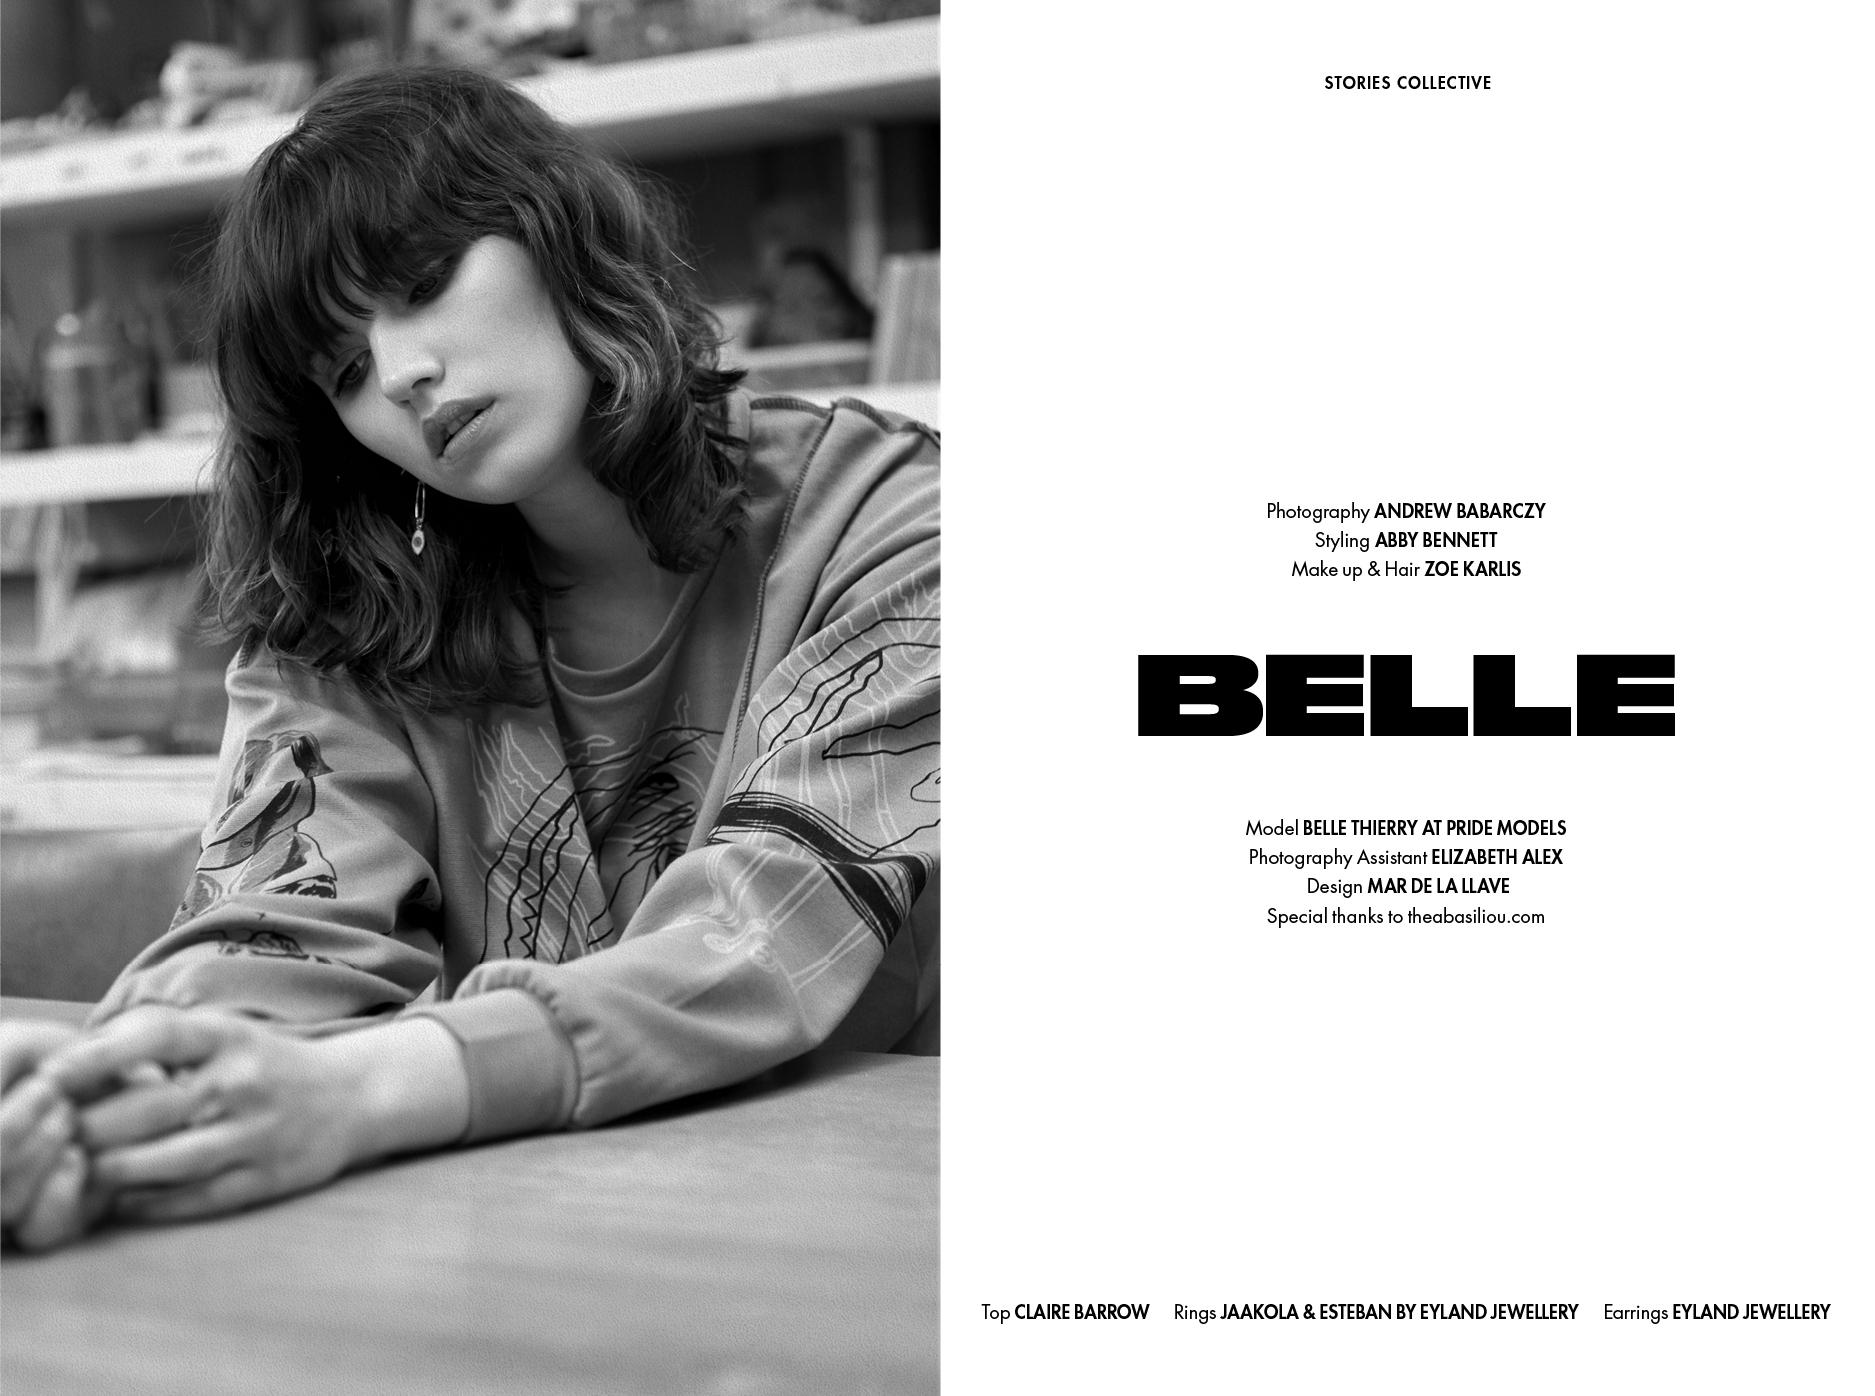 Digital Connections / Belle